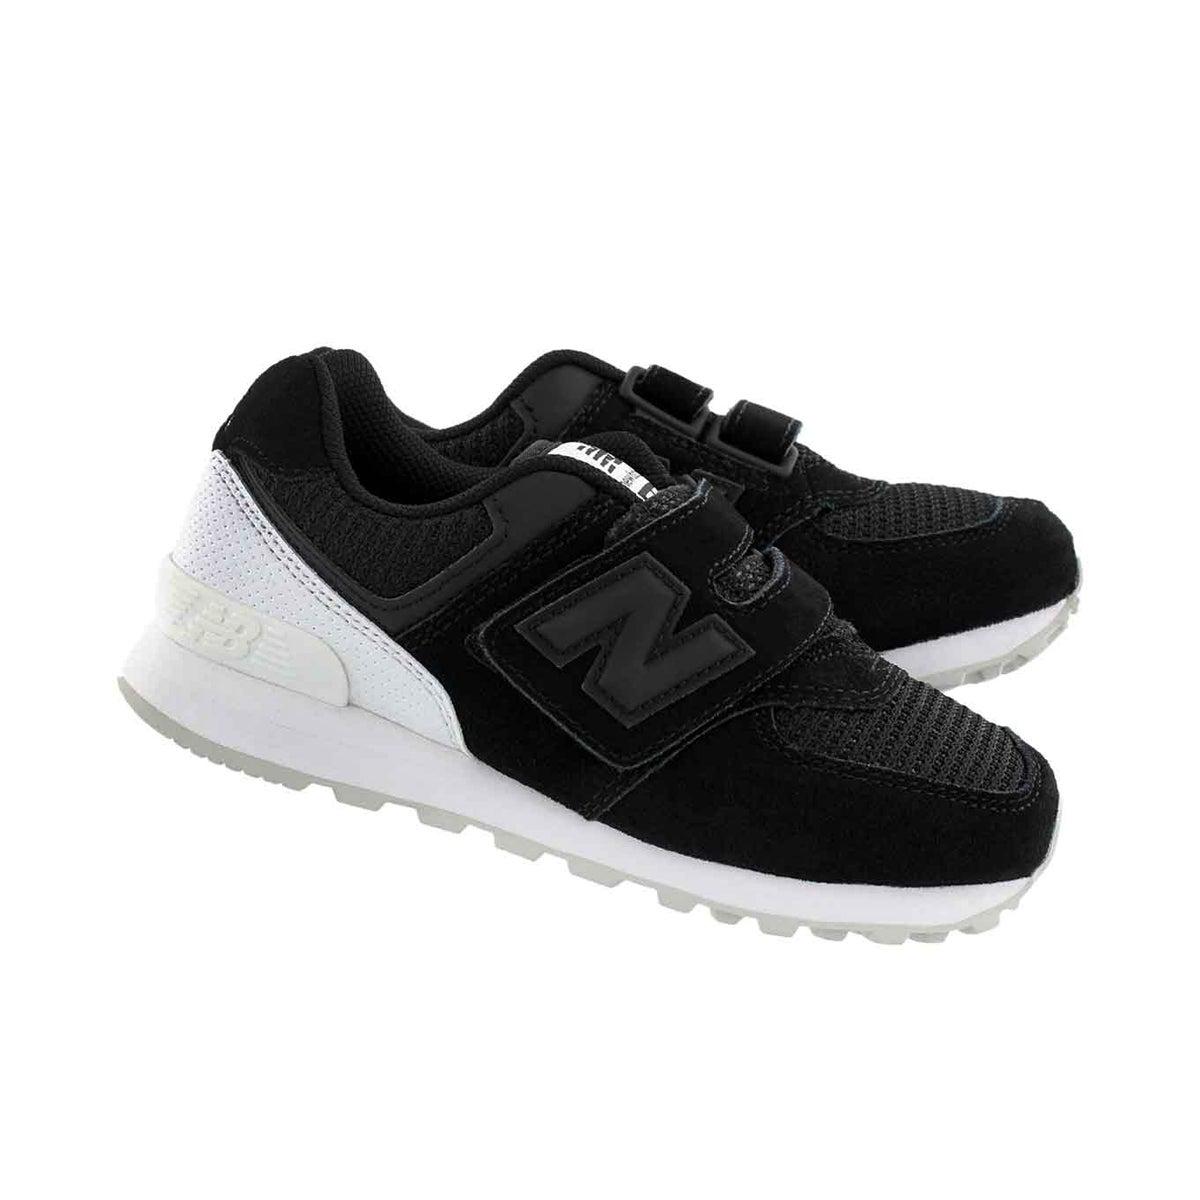 Bys 574 black/white sneaker